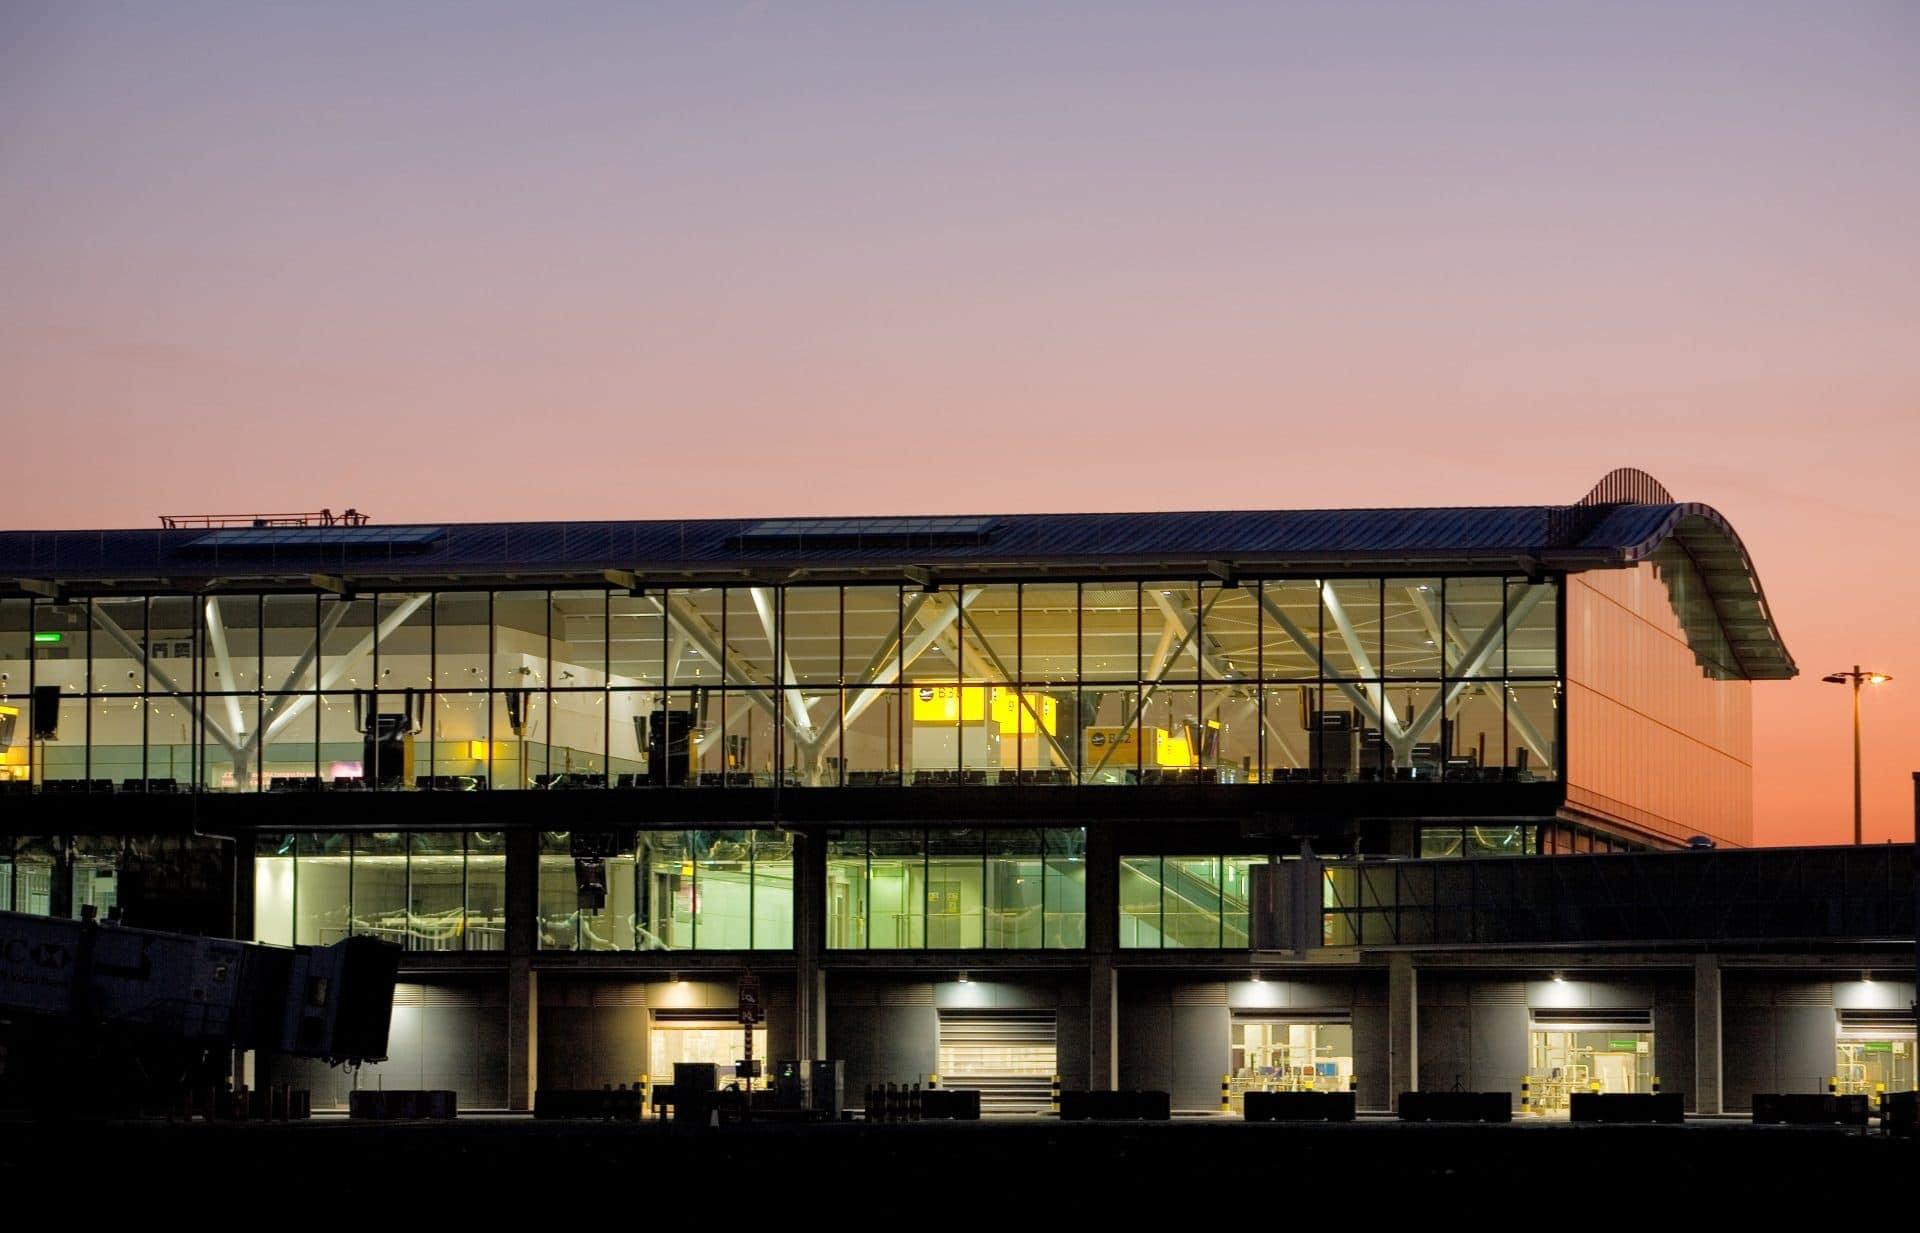 heathrow airport terminal 5 in london